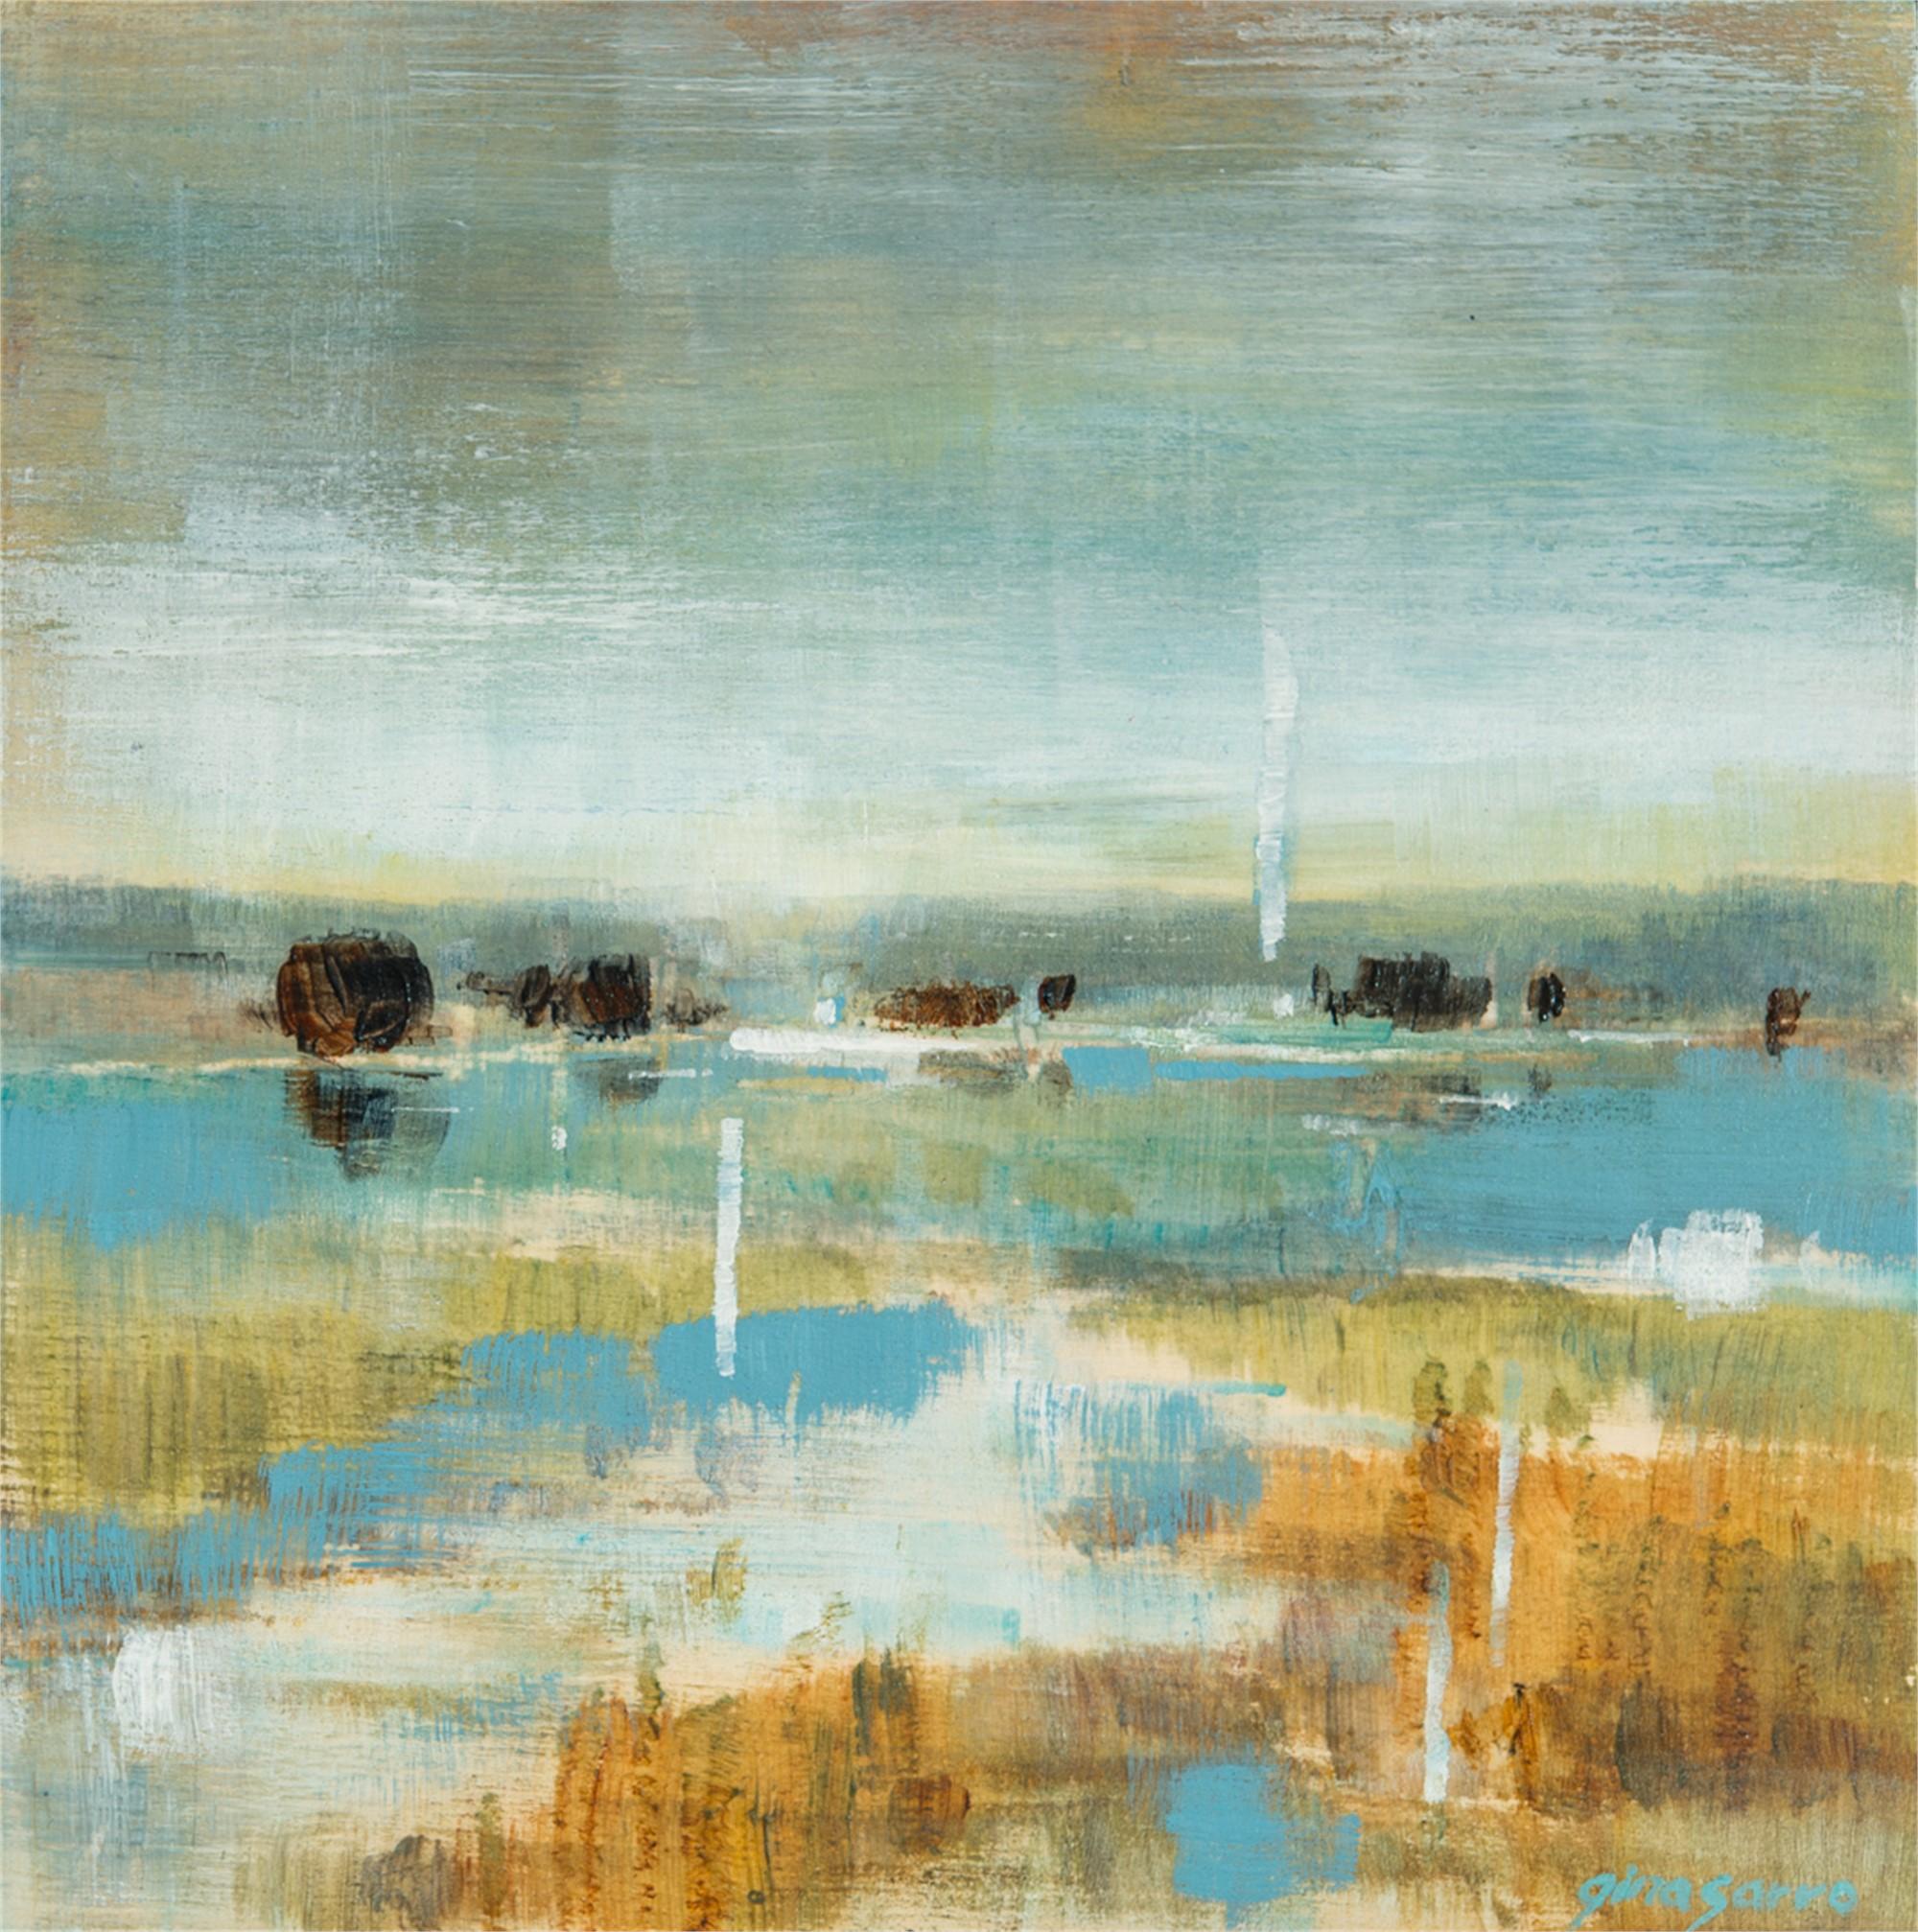 Vertical Horizons 20 by Gina Sarro